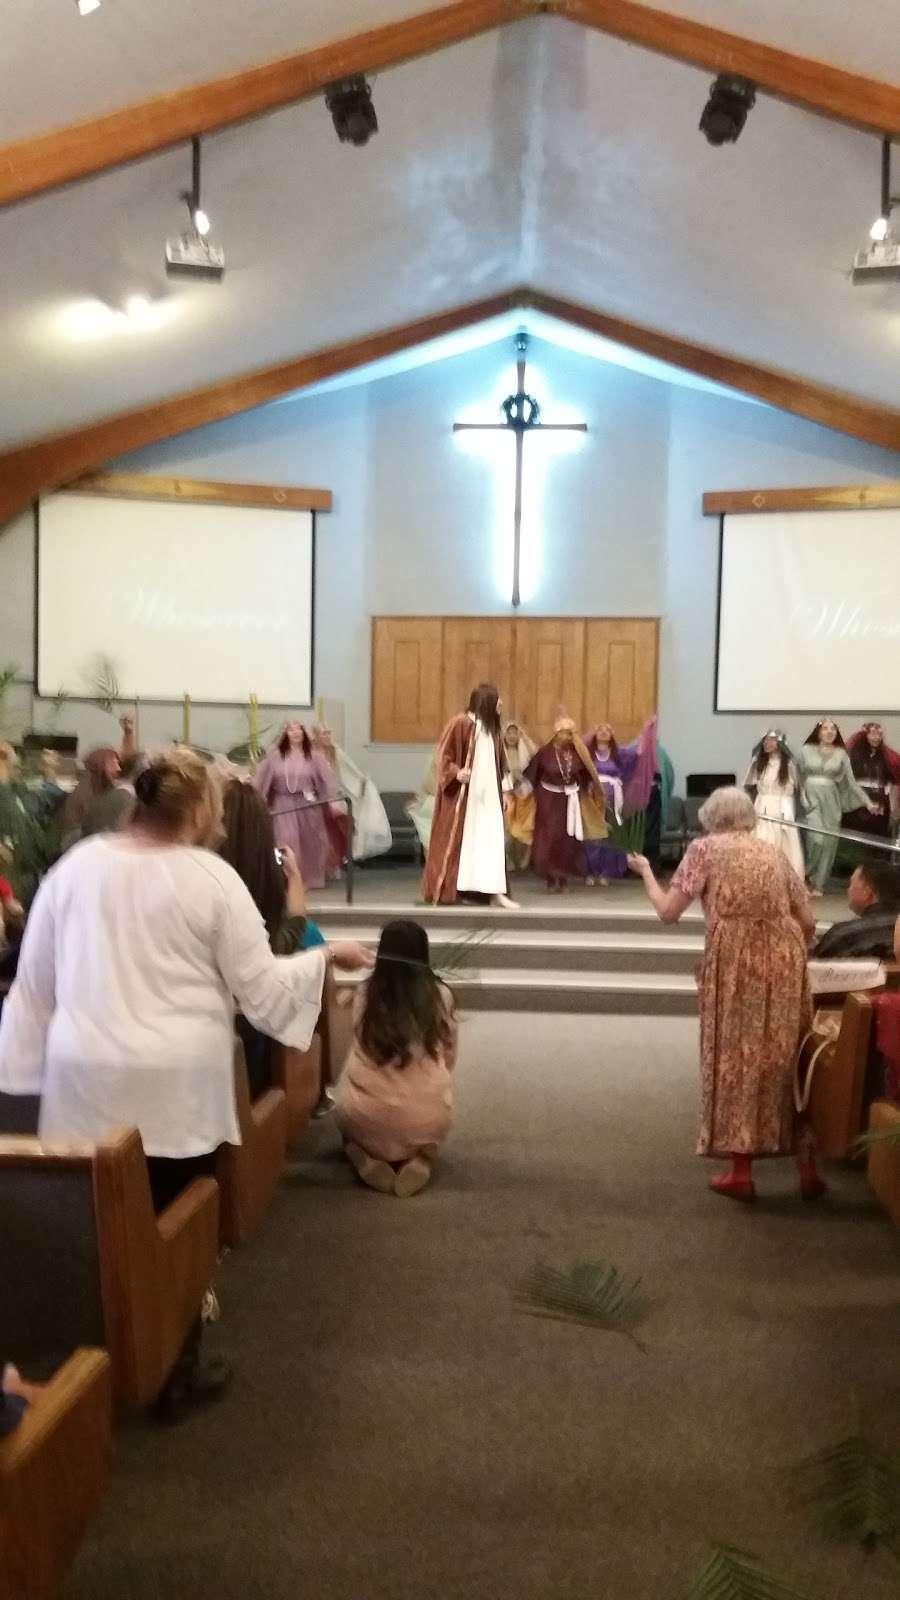 Church For Whosoever - church  | Photo 6 of 7 | Address: 18628 Seneca Rd, Apple Valley, CA 92307, USA | Phone: (760) 242-3191